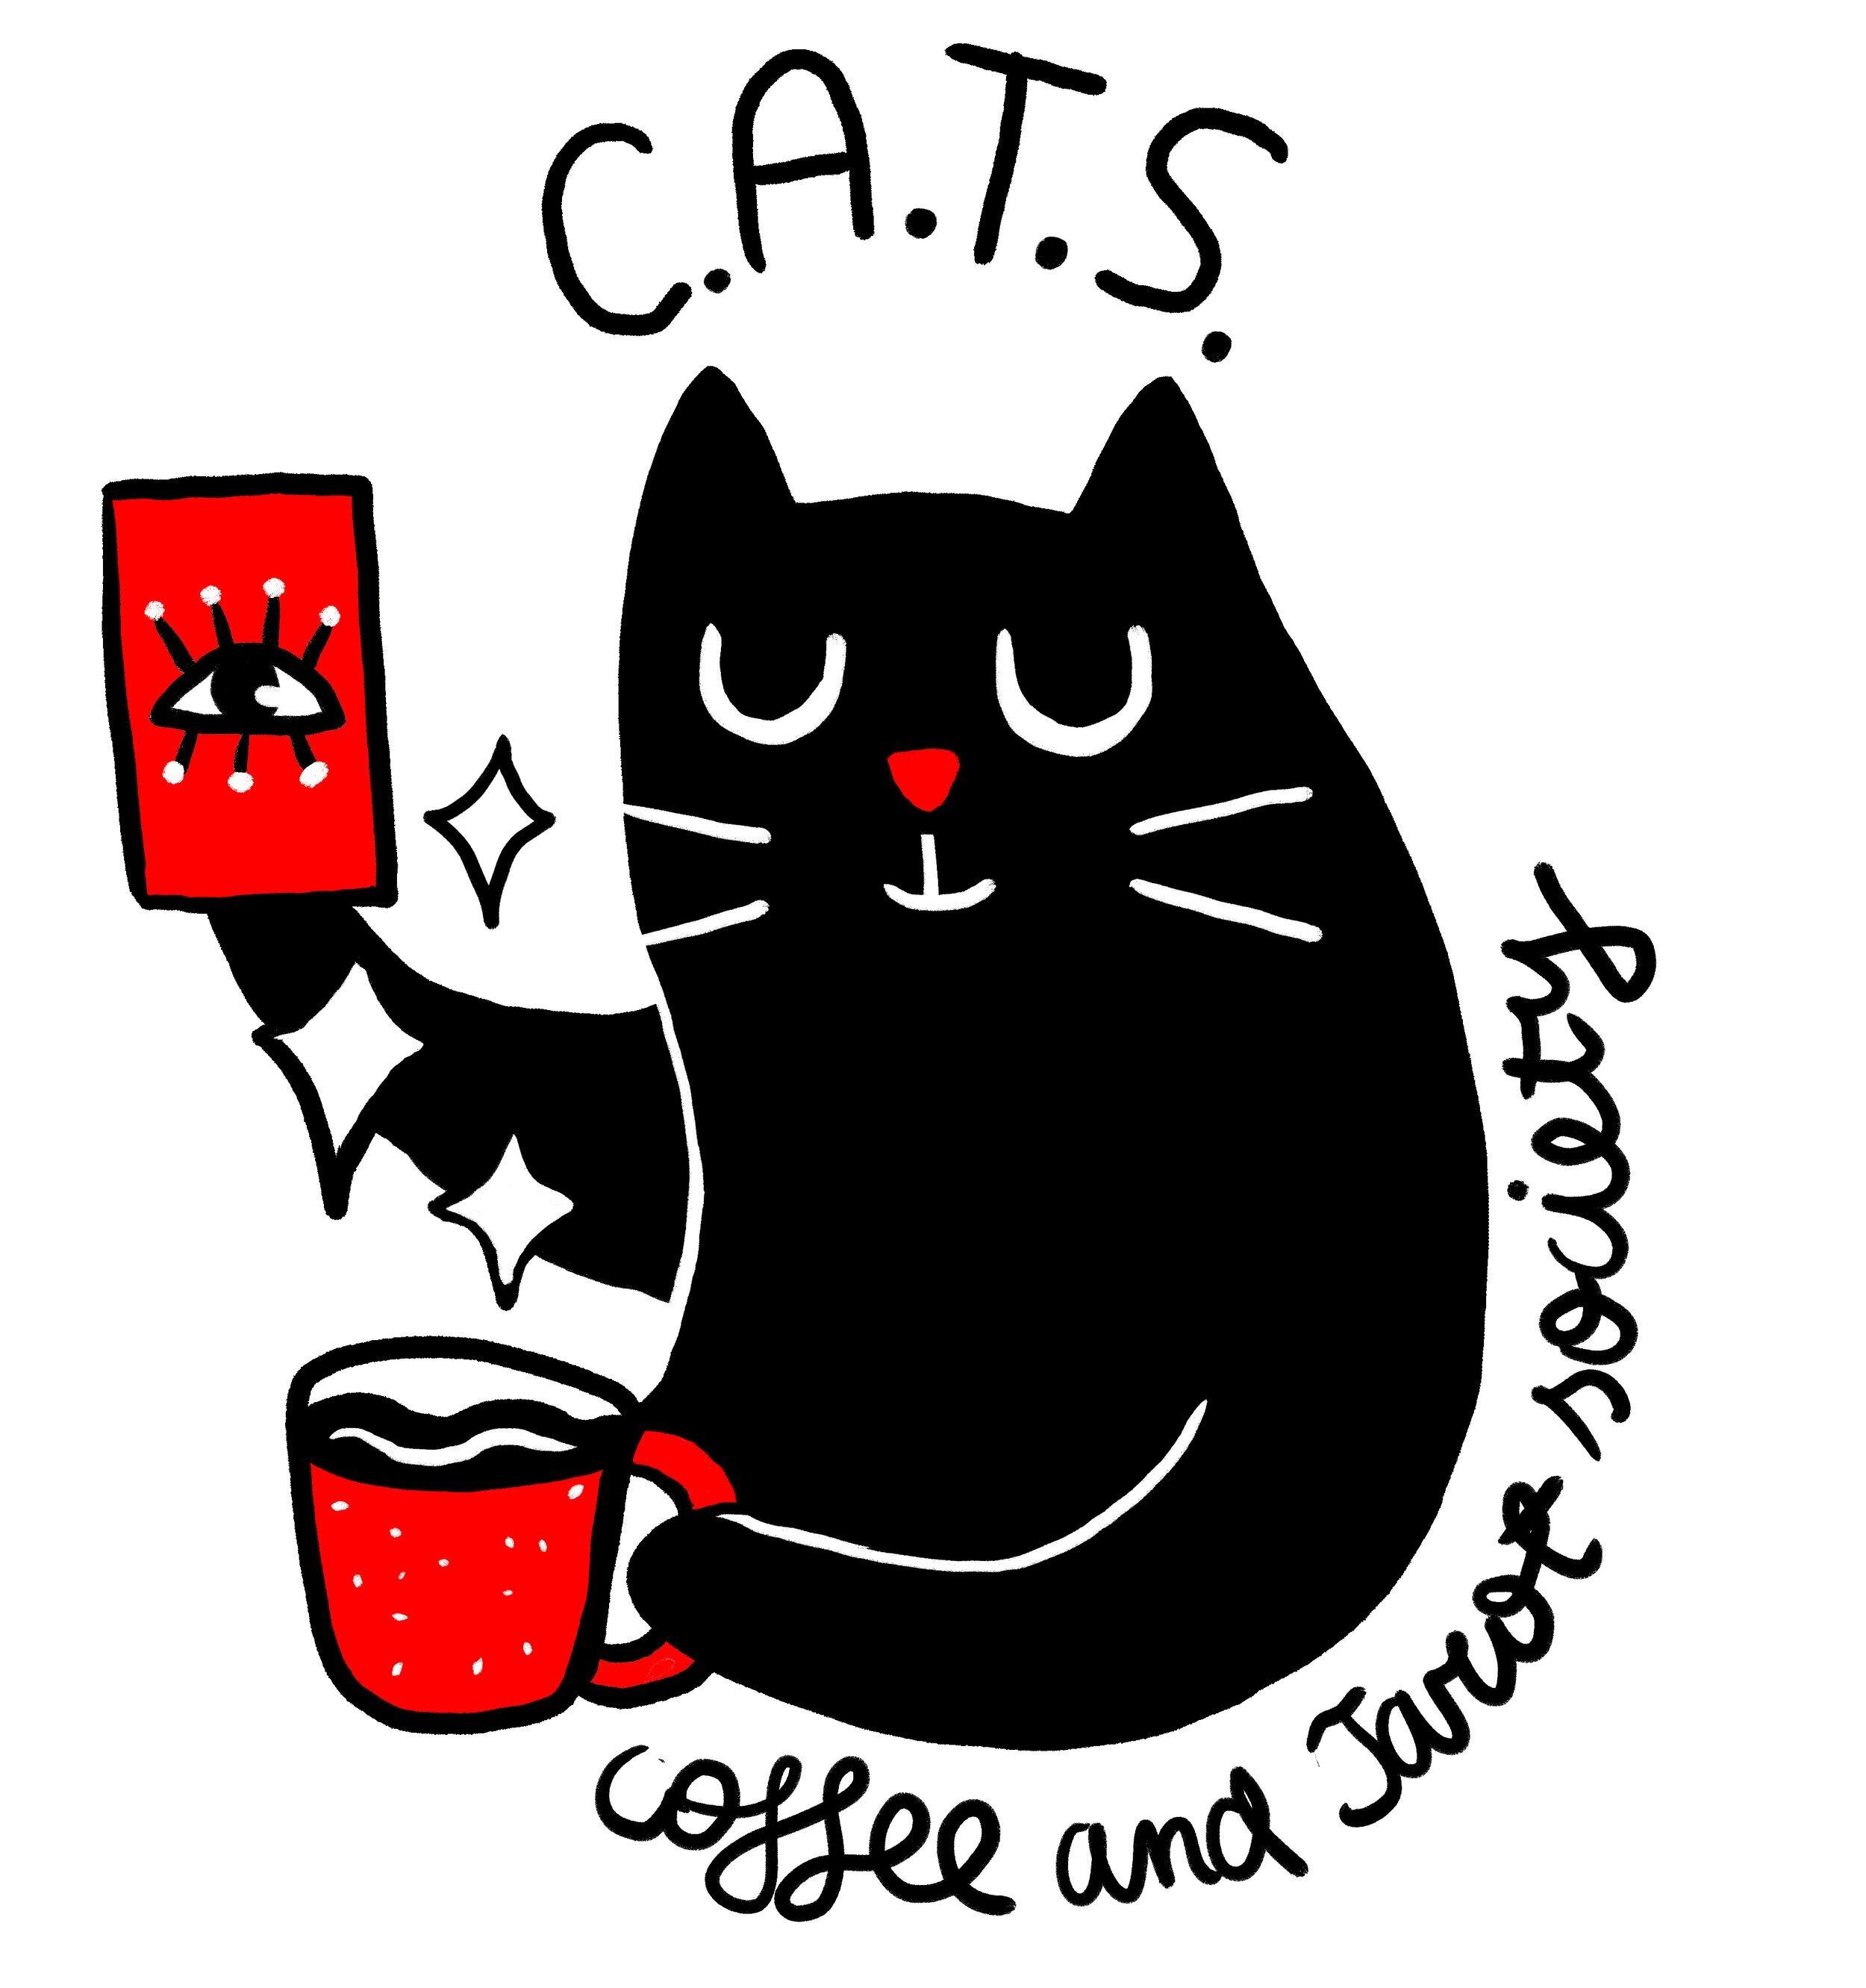 CATS+logo+copy+2.jpg